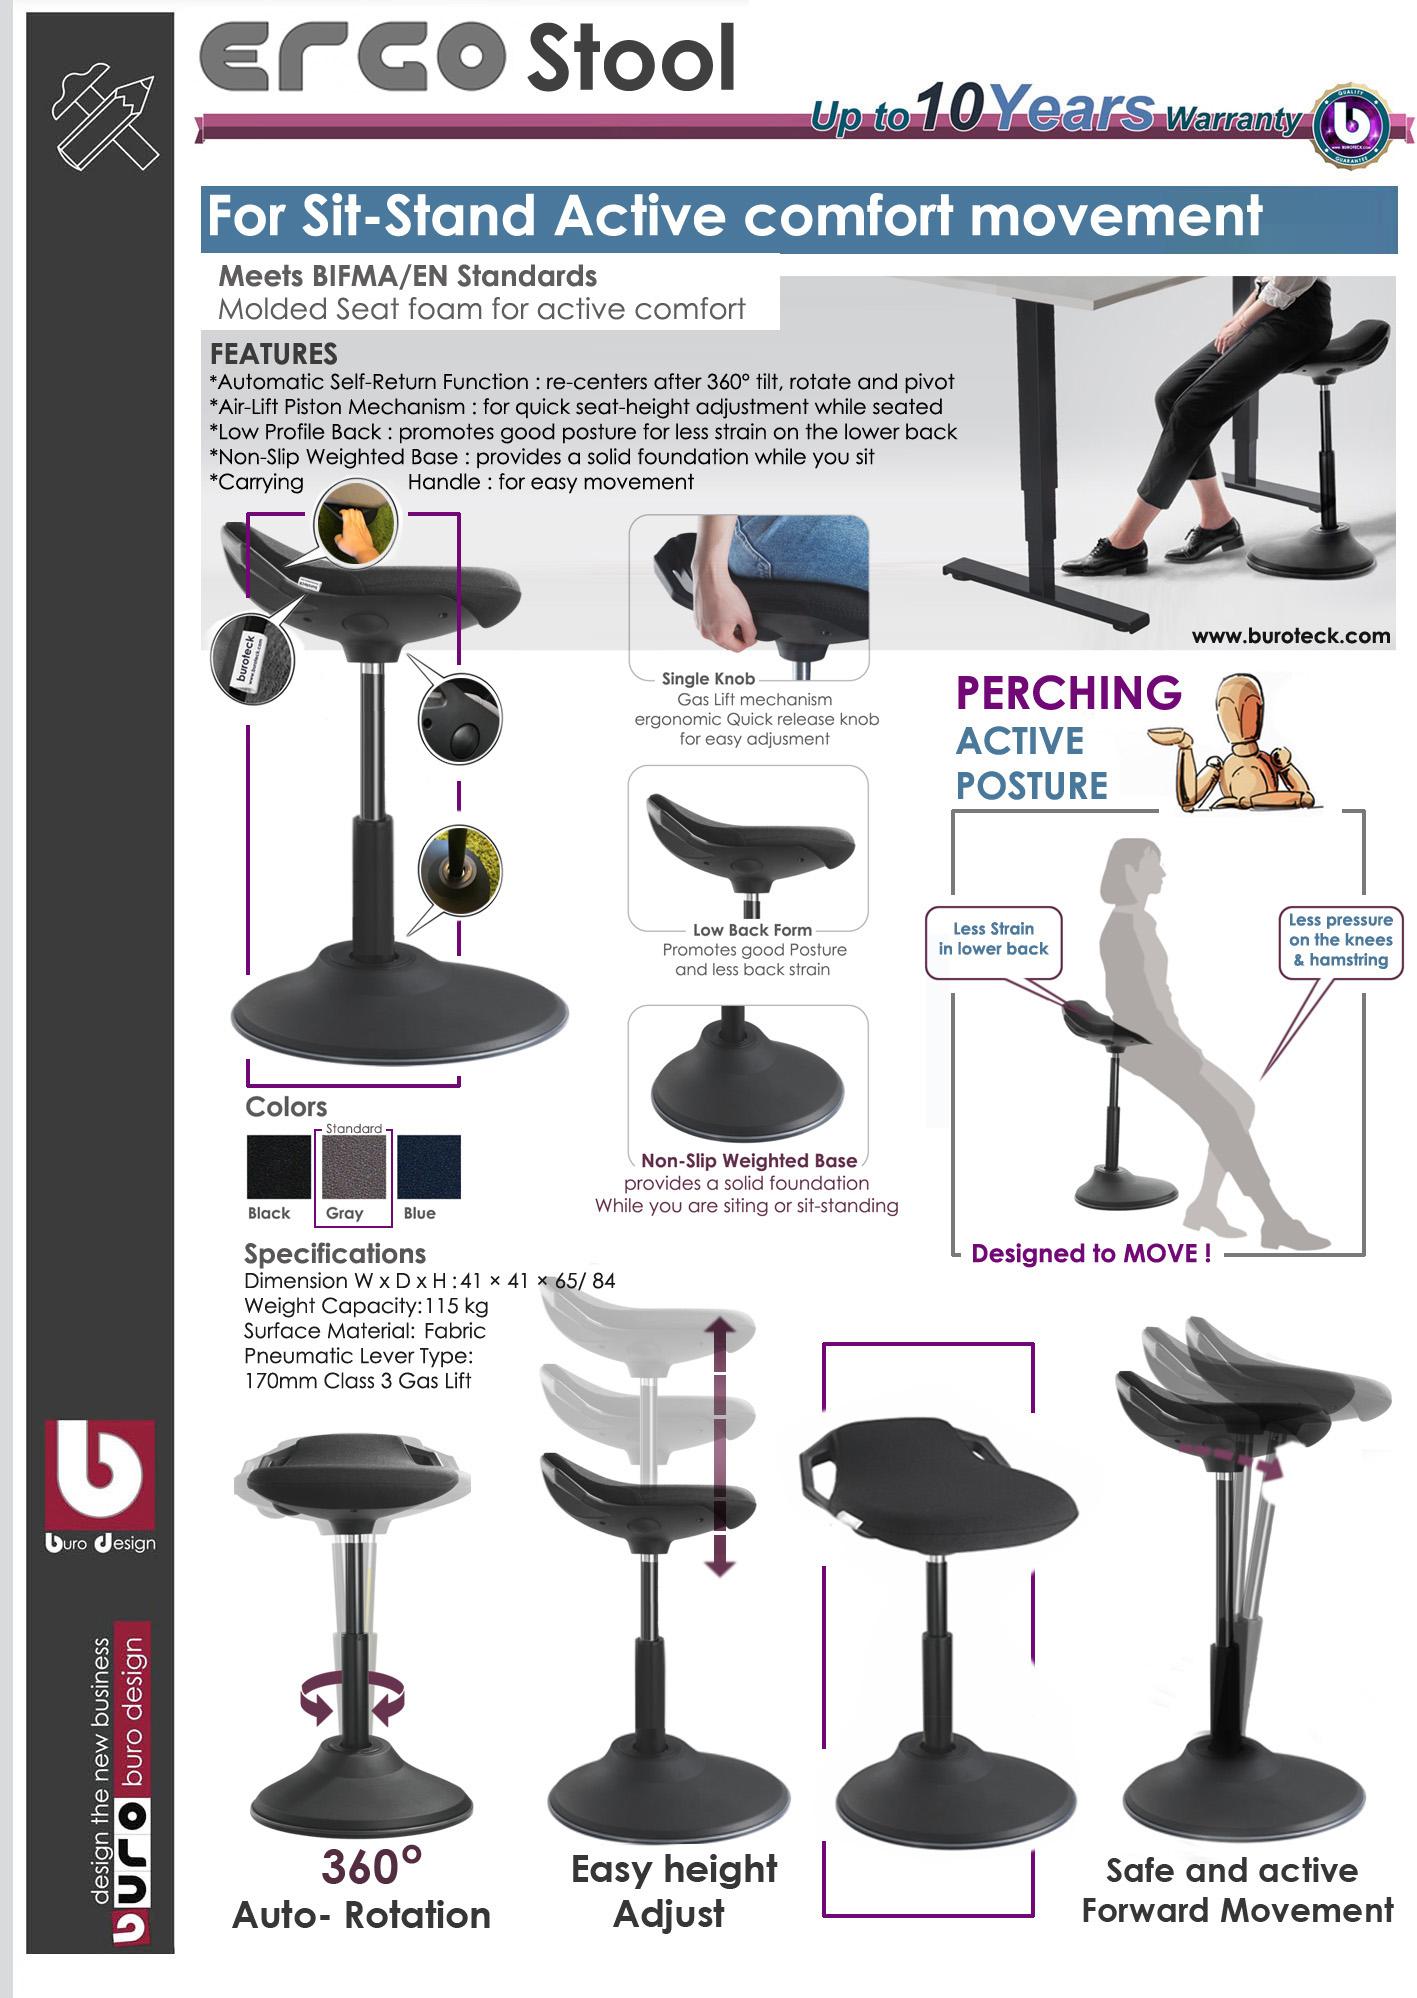 stool chair dubai covers protect from cats ergo buroseat ergonomic sit stand ergostool